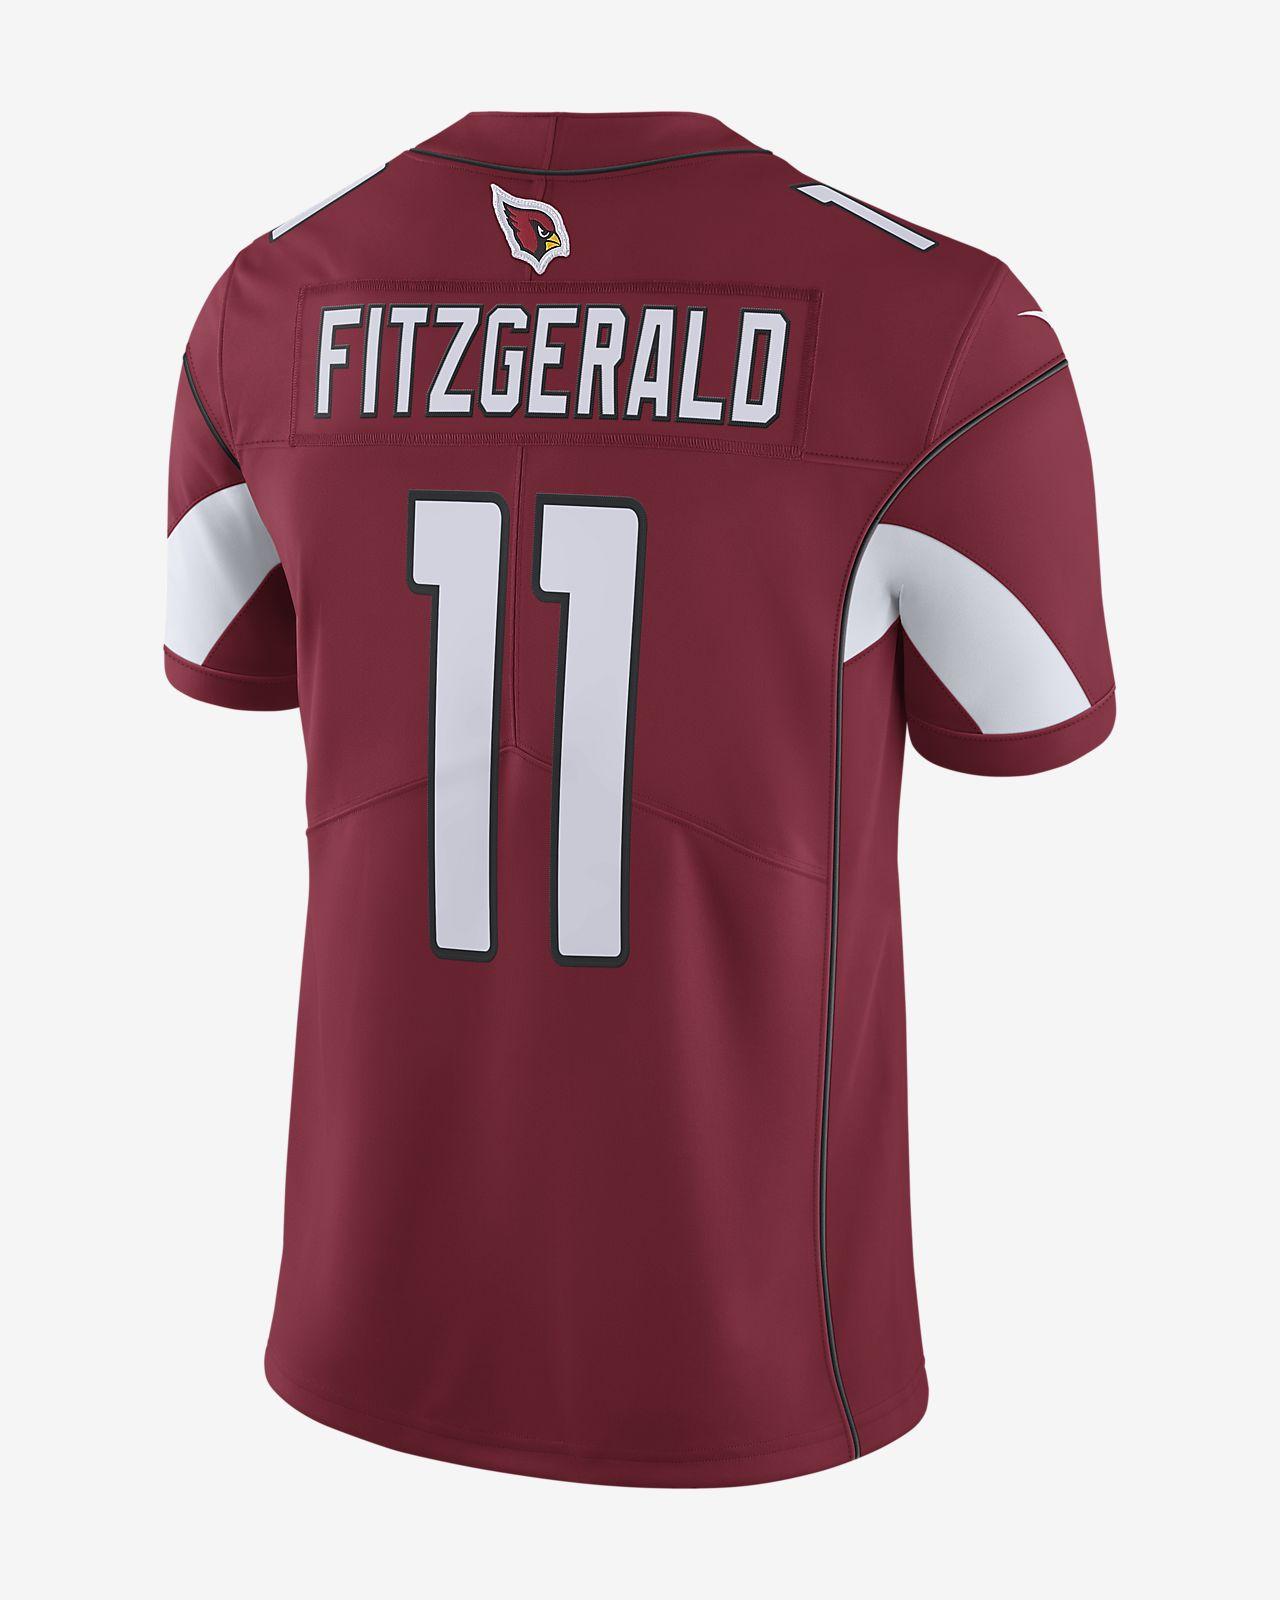 1981426fea70 ... NFL Arizona Cardinals Limited (Larry Fitzgerald) Men s Football Jersey